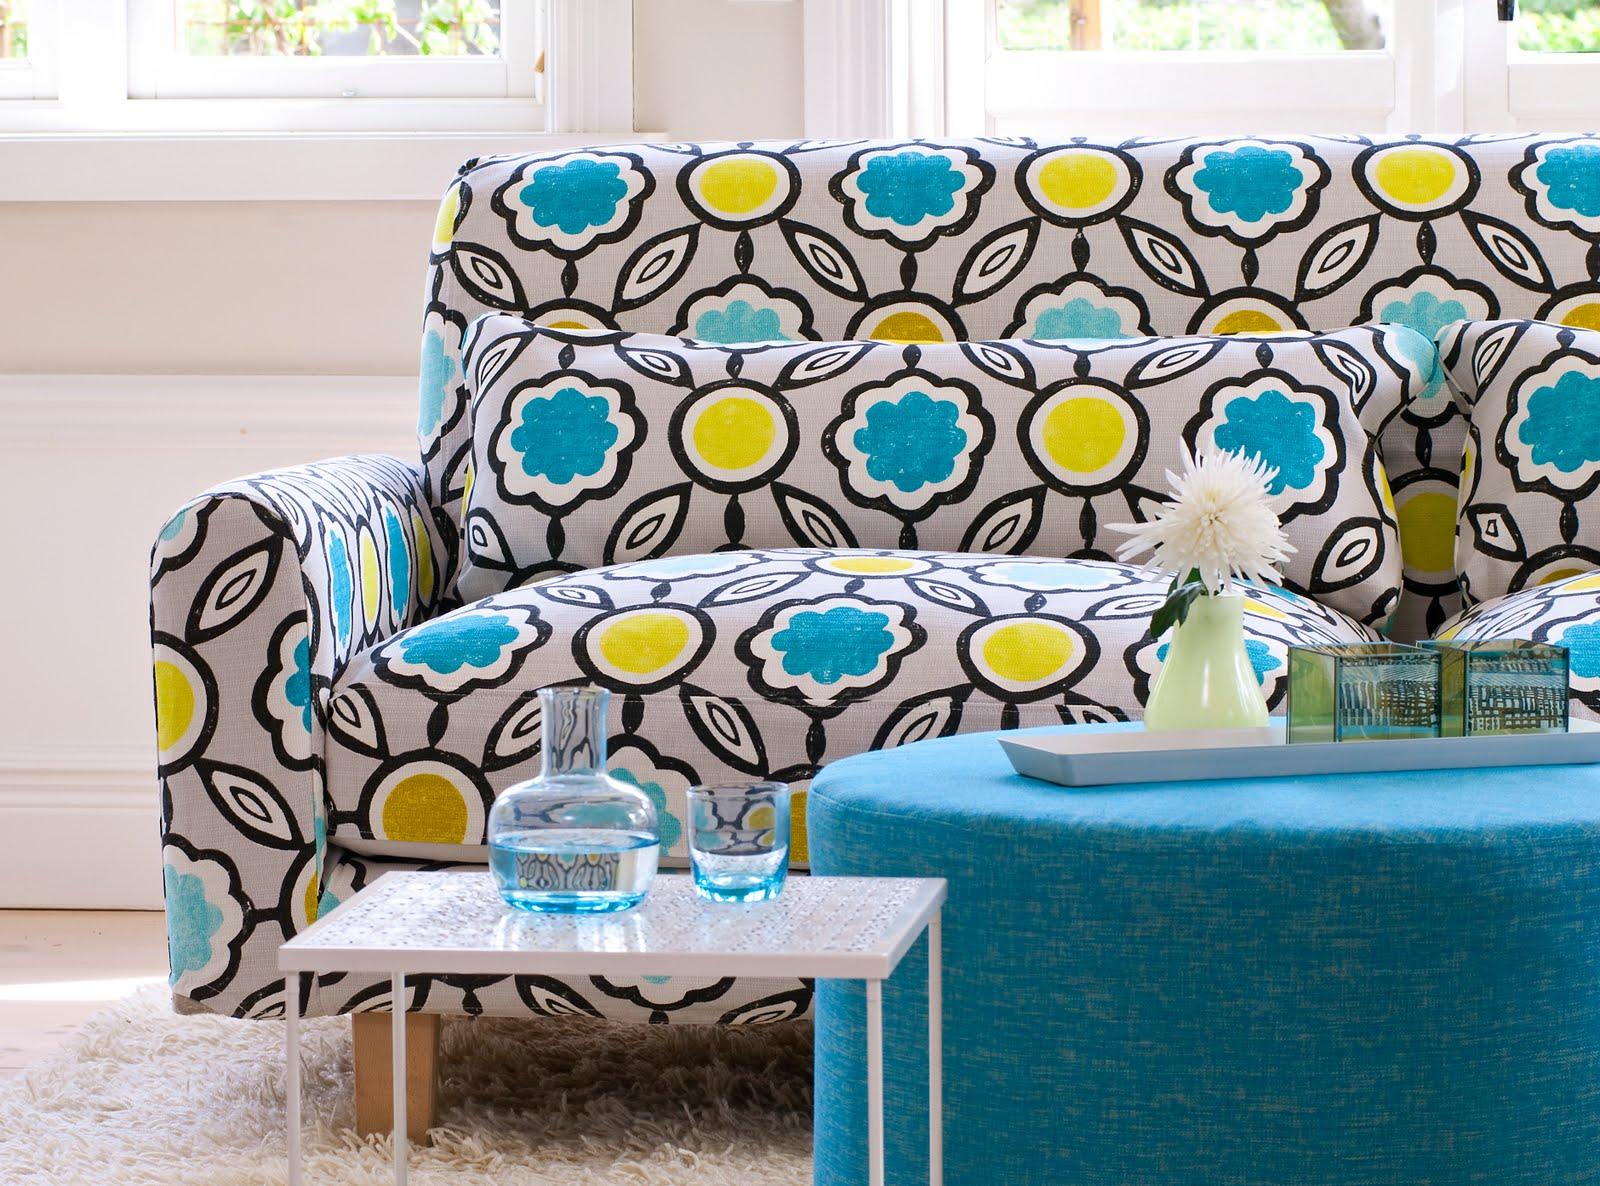 formschoen i wortgewandt englisch spanisch schwedisch mix. Black Bedroom Furniture Sets. Home Design Ideas